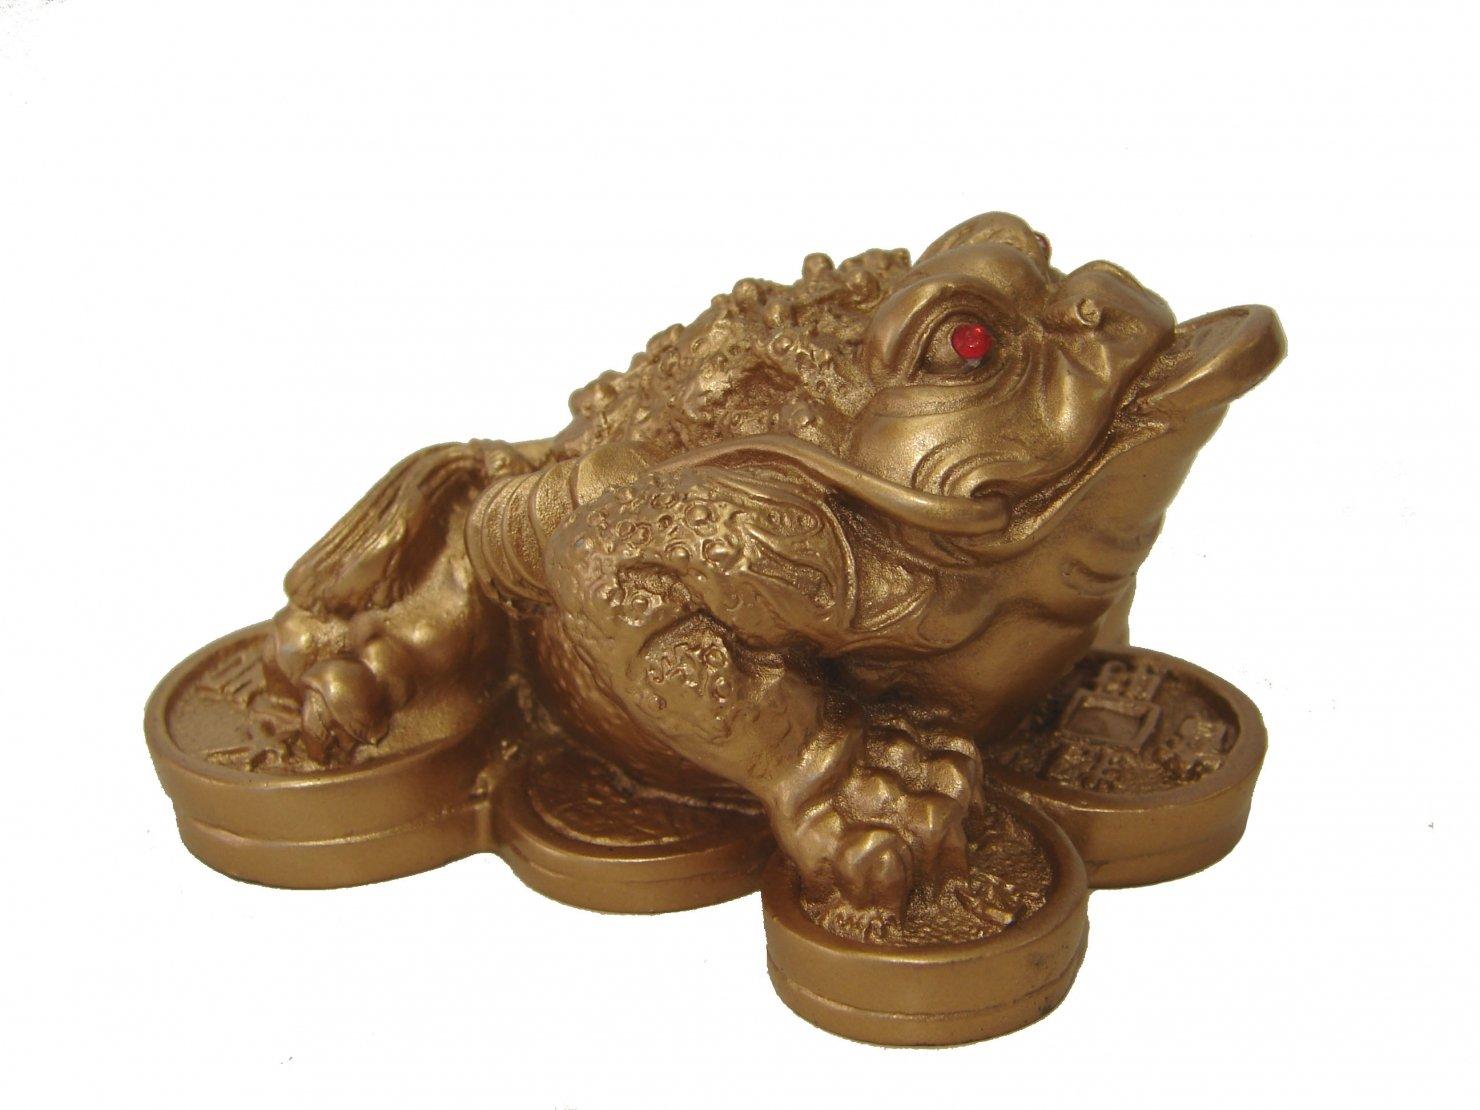 Amazon 1 X Feng Shui Money Frog Money Toad Attract Wealth